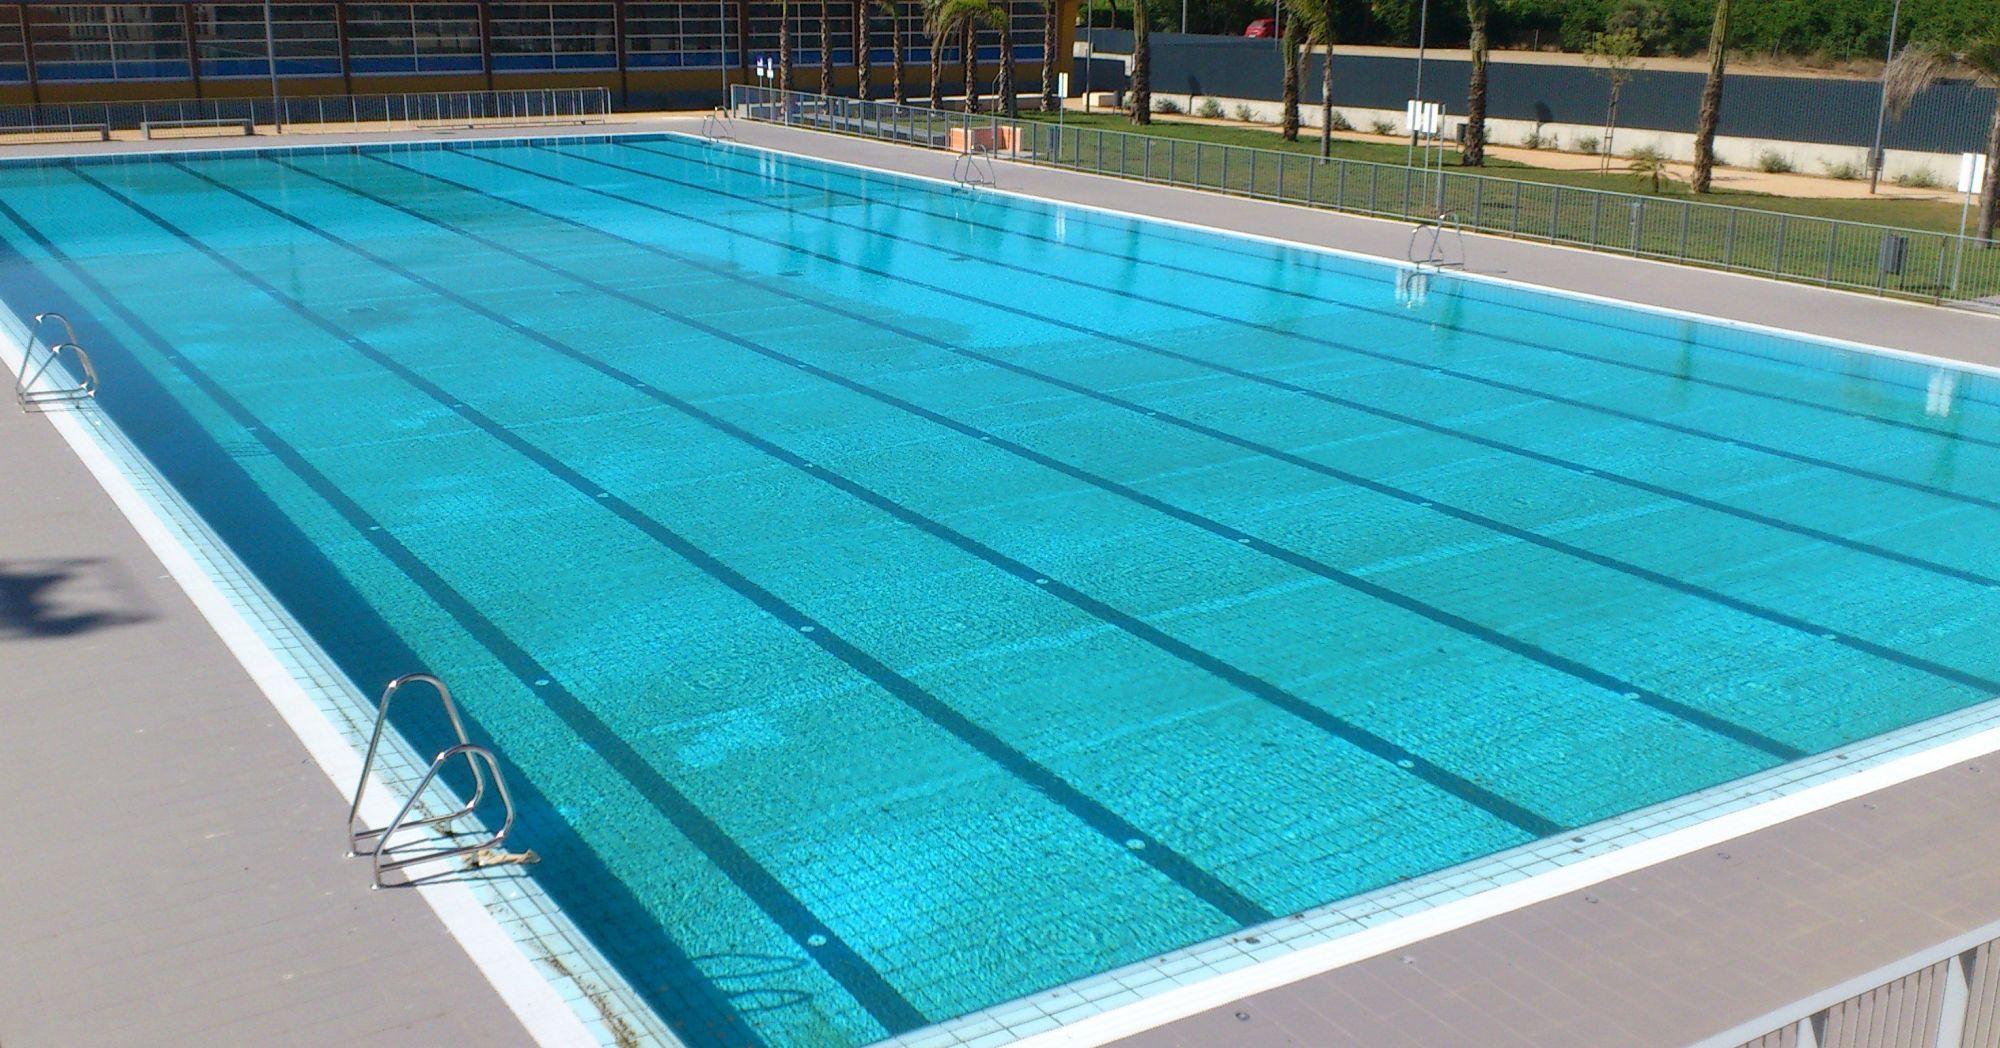 Rea de piscinas al aire libre palma del r o for Piscina 50 metros barcelona